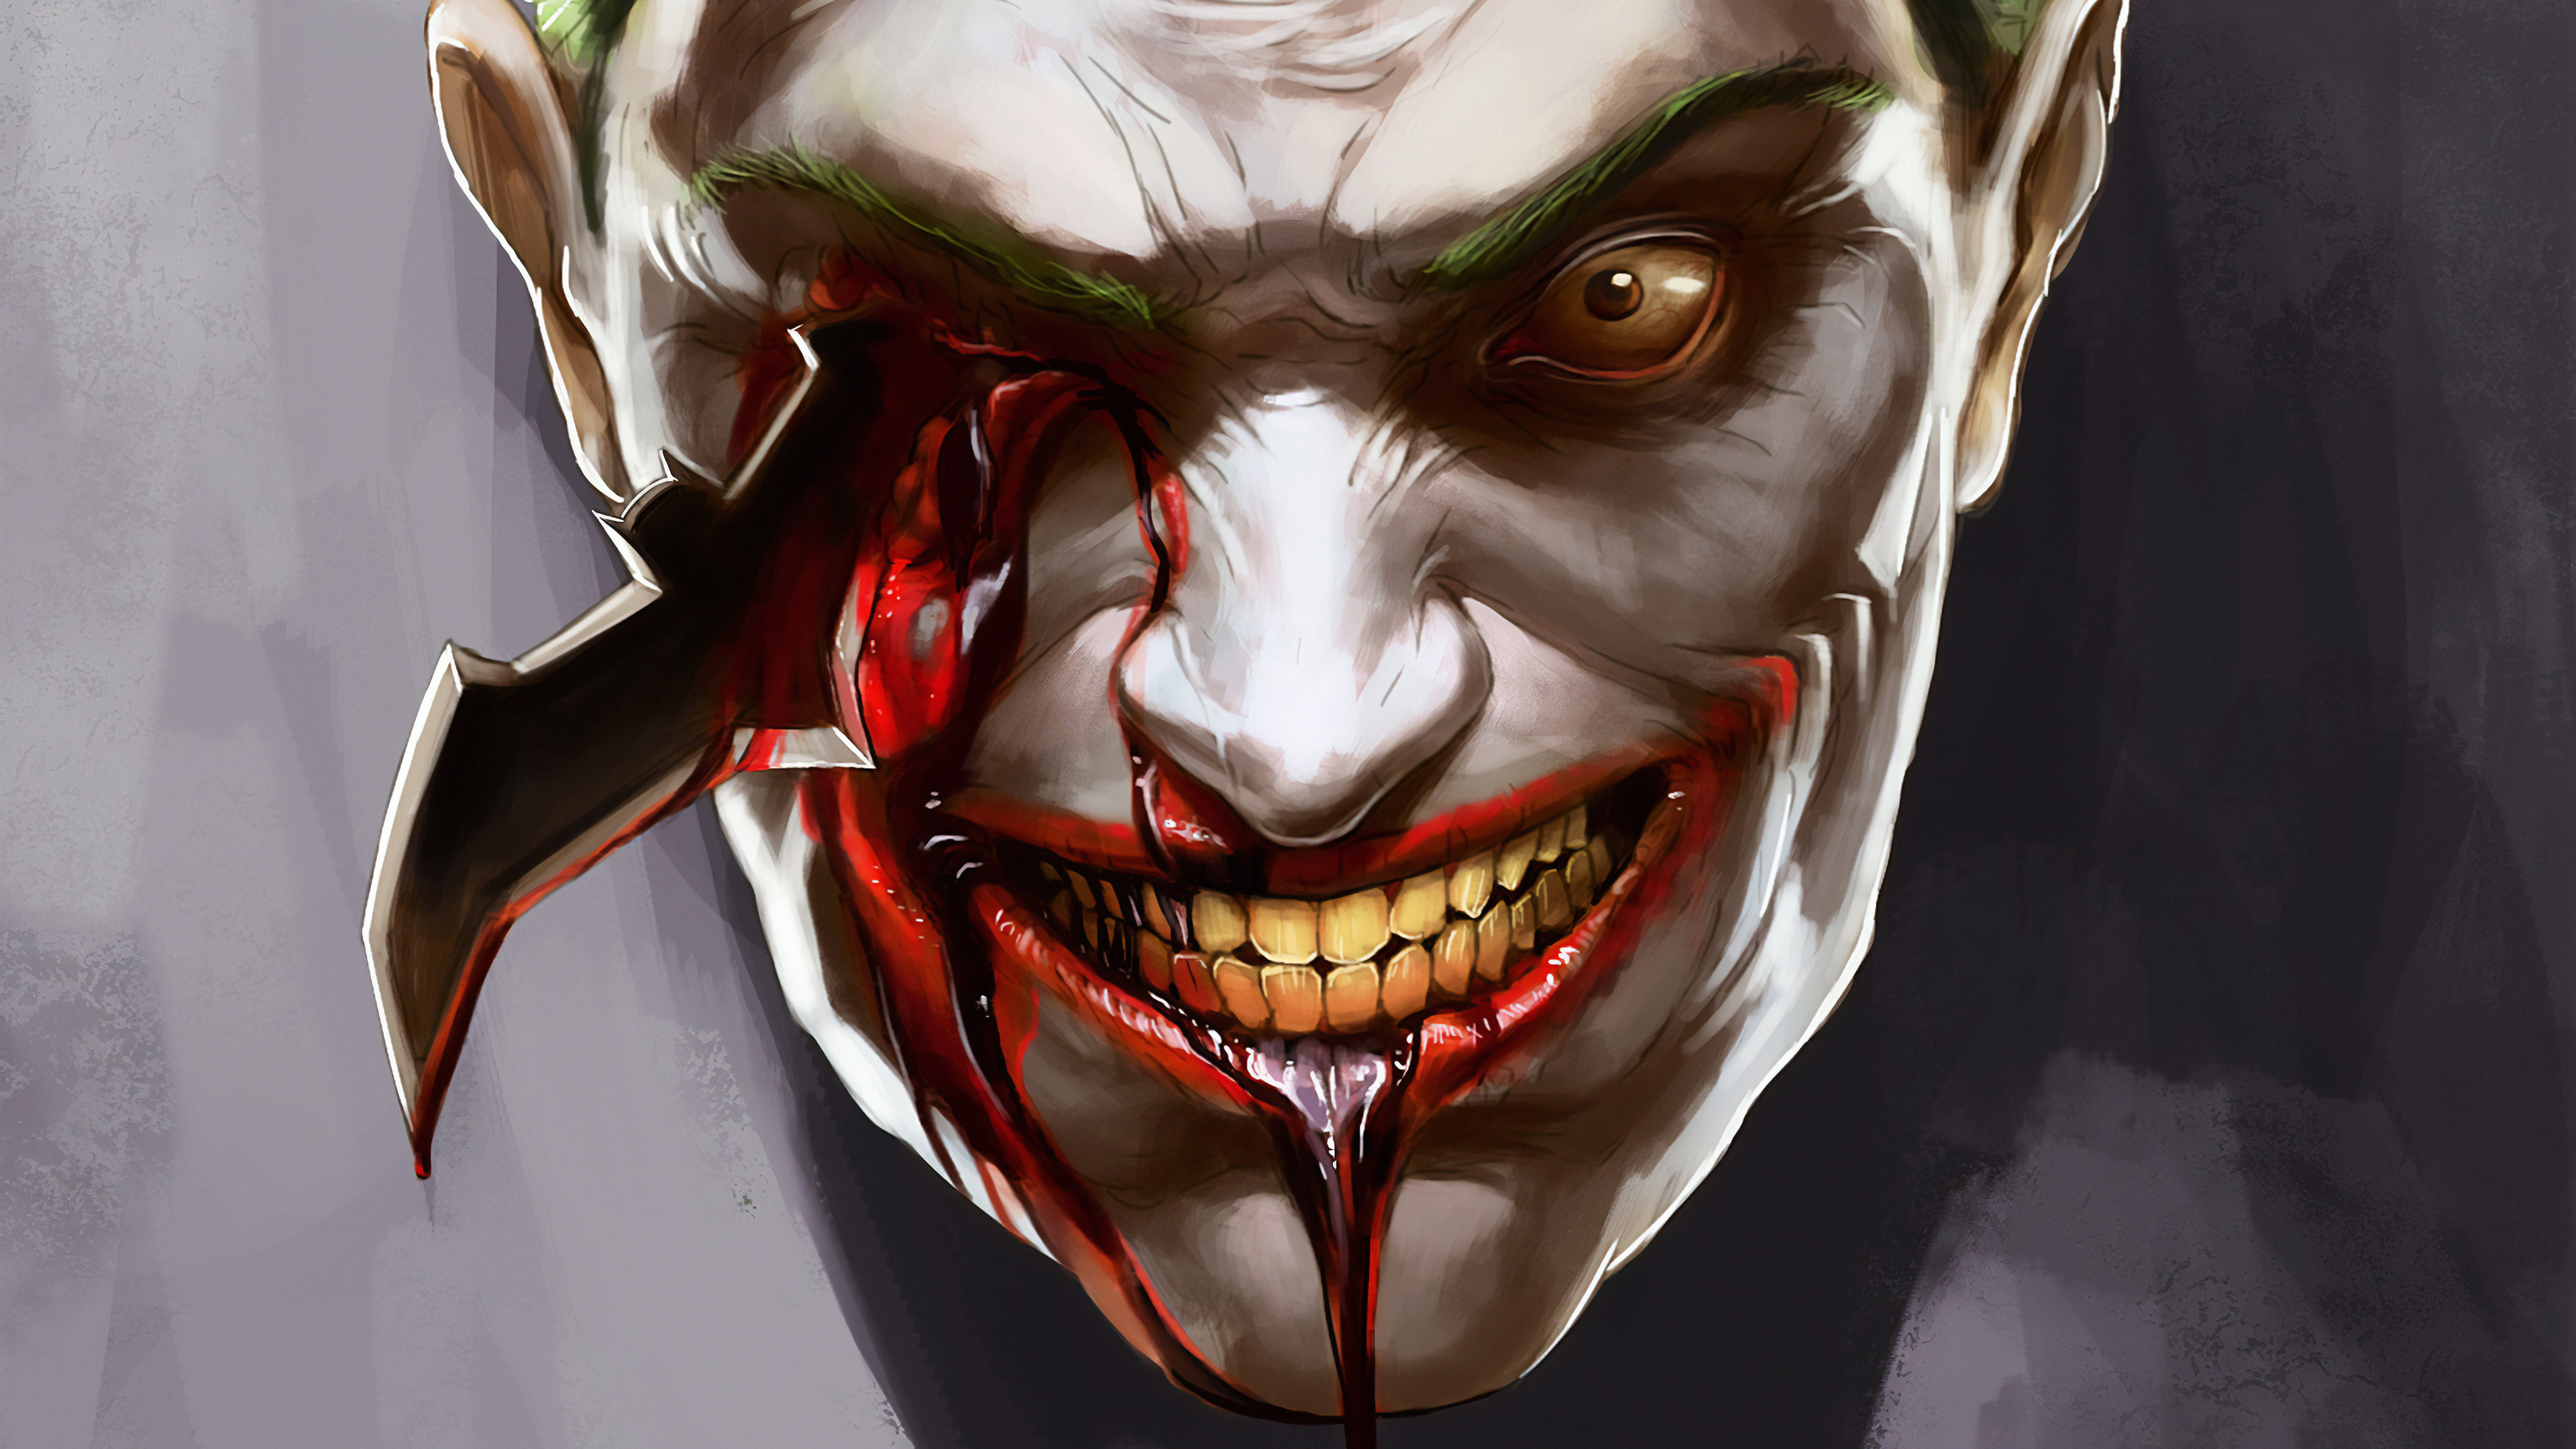 joker eye destroyed with batrage 1570394485 - Joker Eye Destroyed With Batrage - superheroes wallpapers, joker wallpapers, hd-wallpapers, dc comics wallpapers, artstation wallpapers, 4k-wallpapers